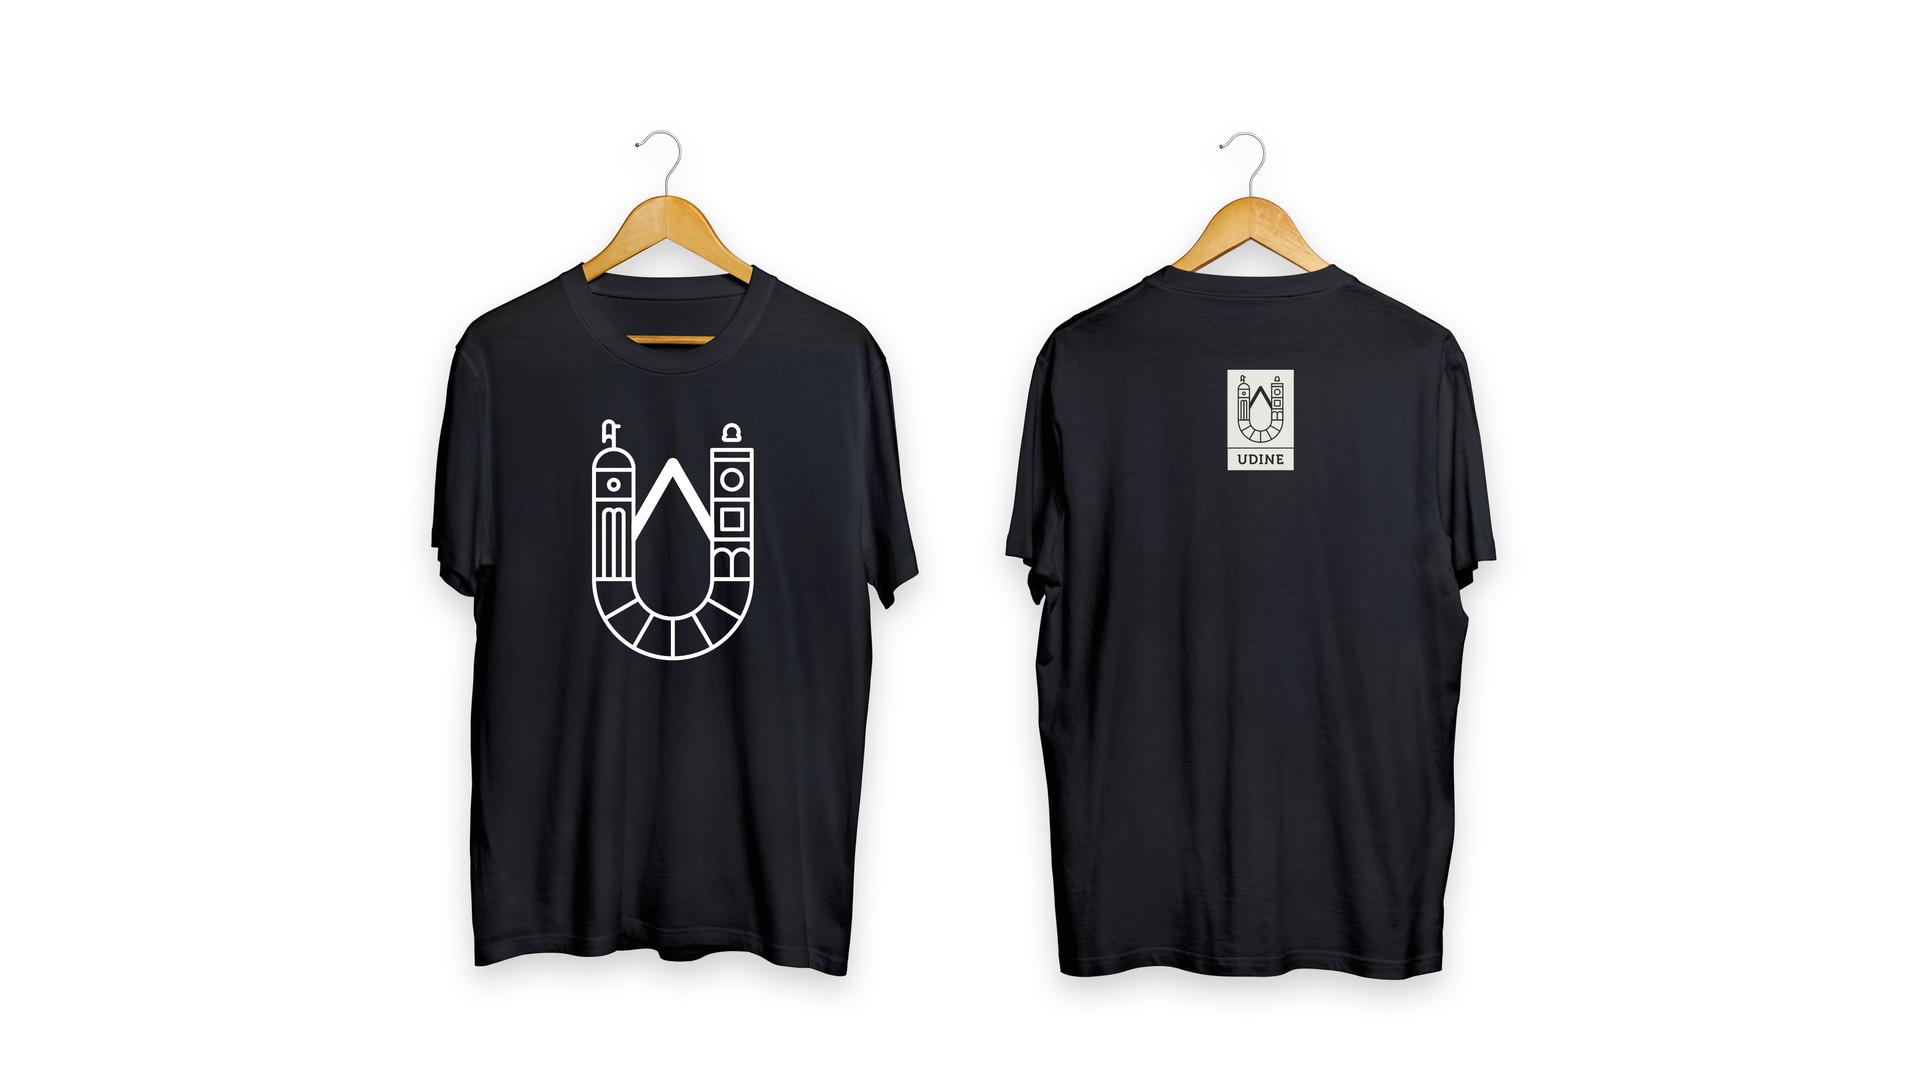 Udine_tshirts_citybranding